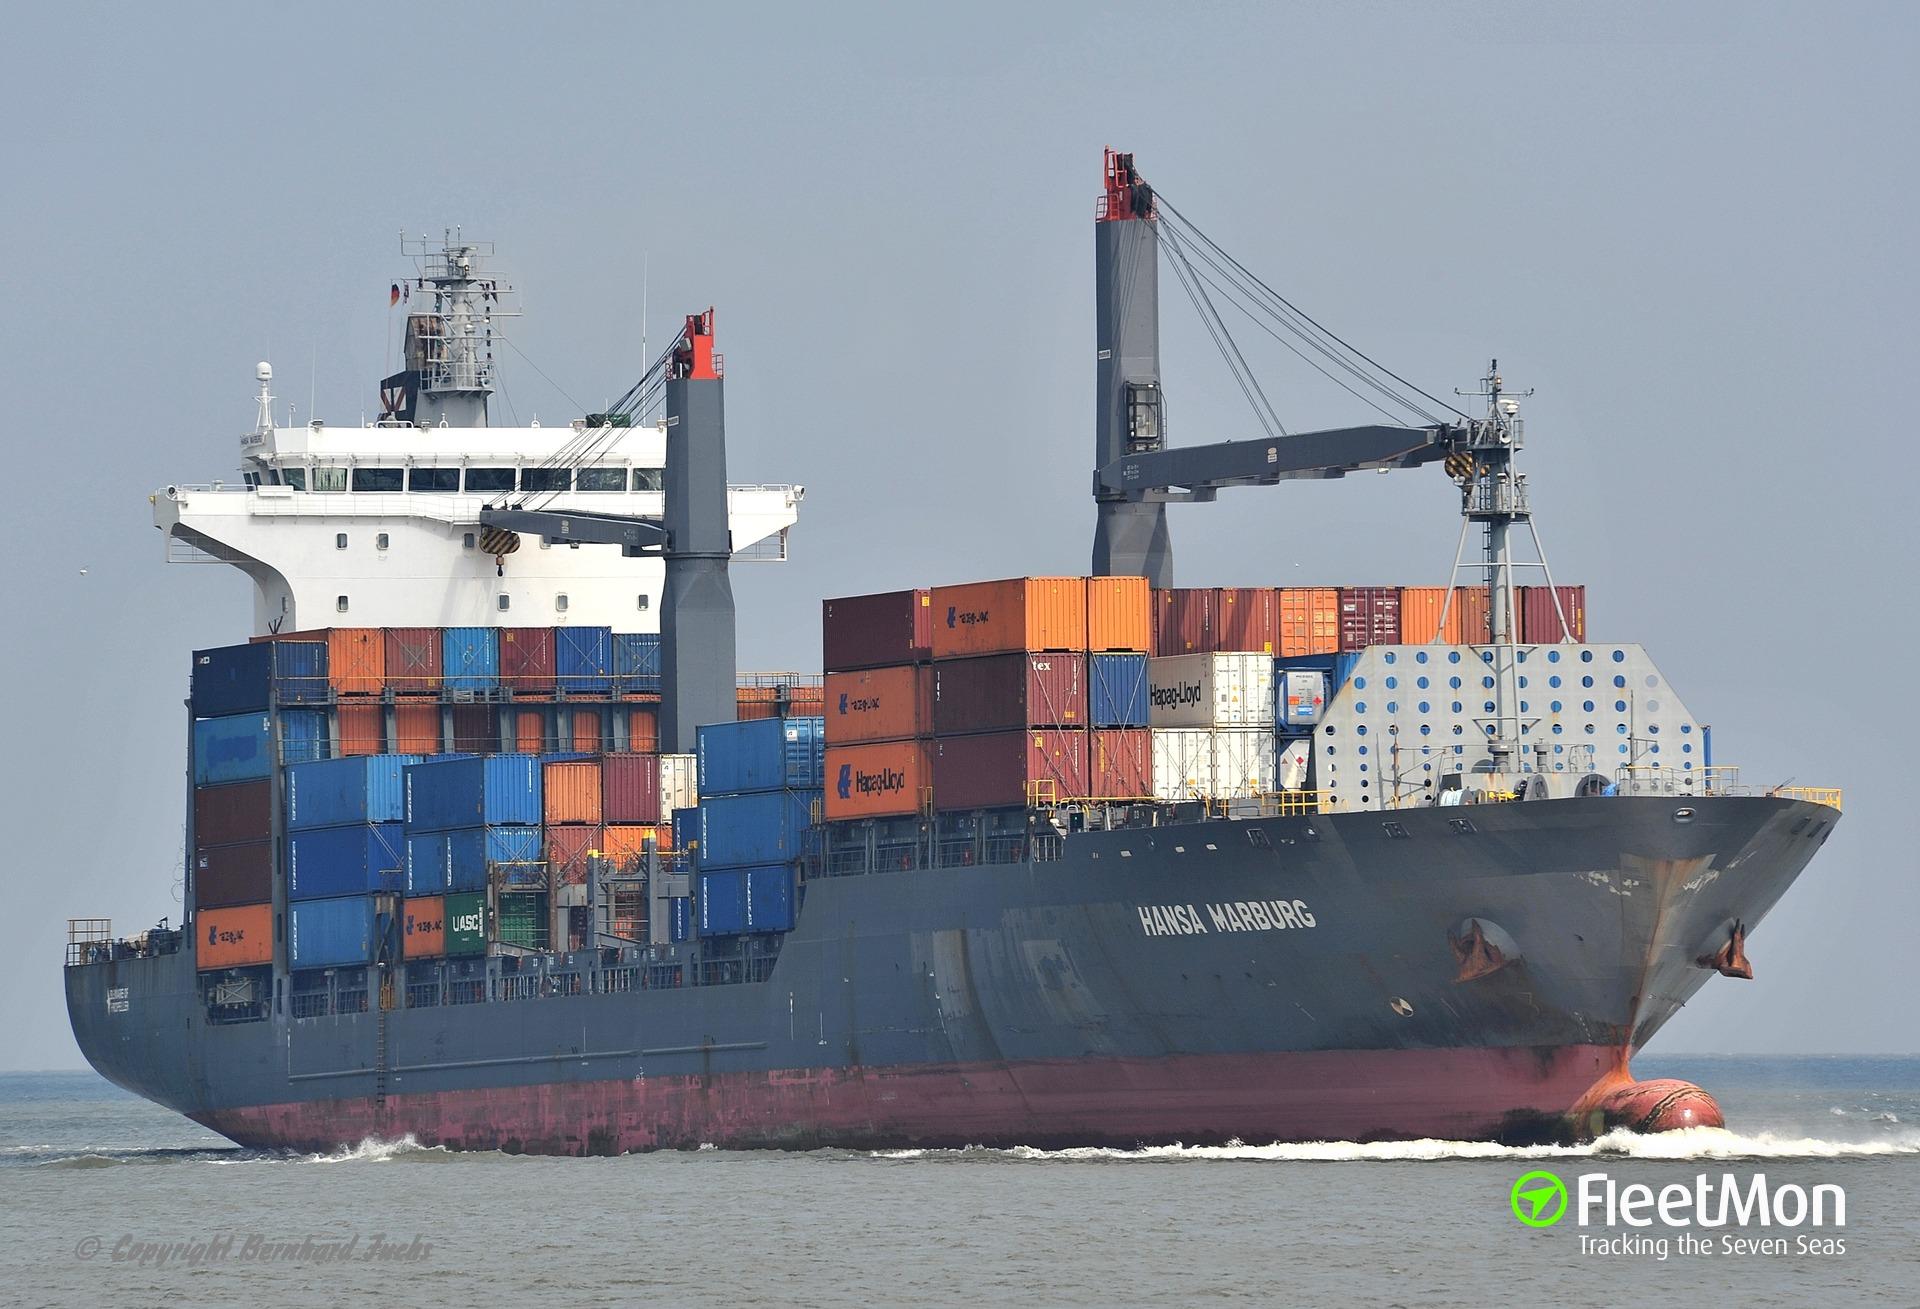 German boxship Hansa Marburg attacked by pirates, 4 crew hijacked, Nigeria